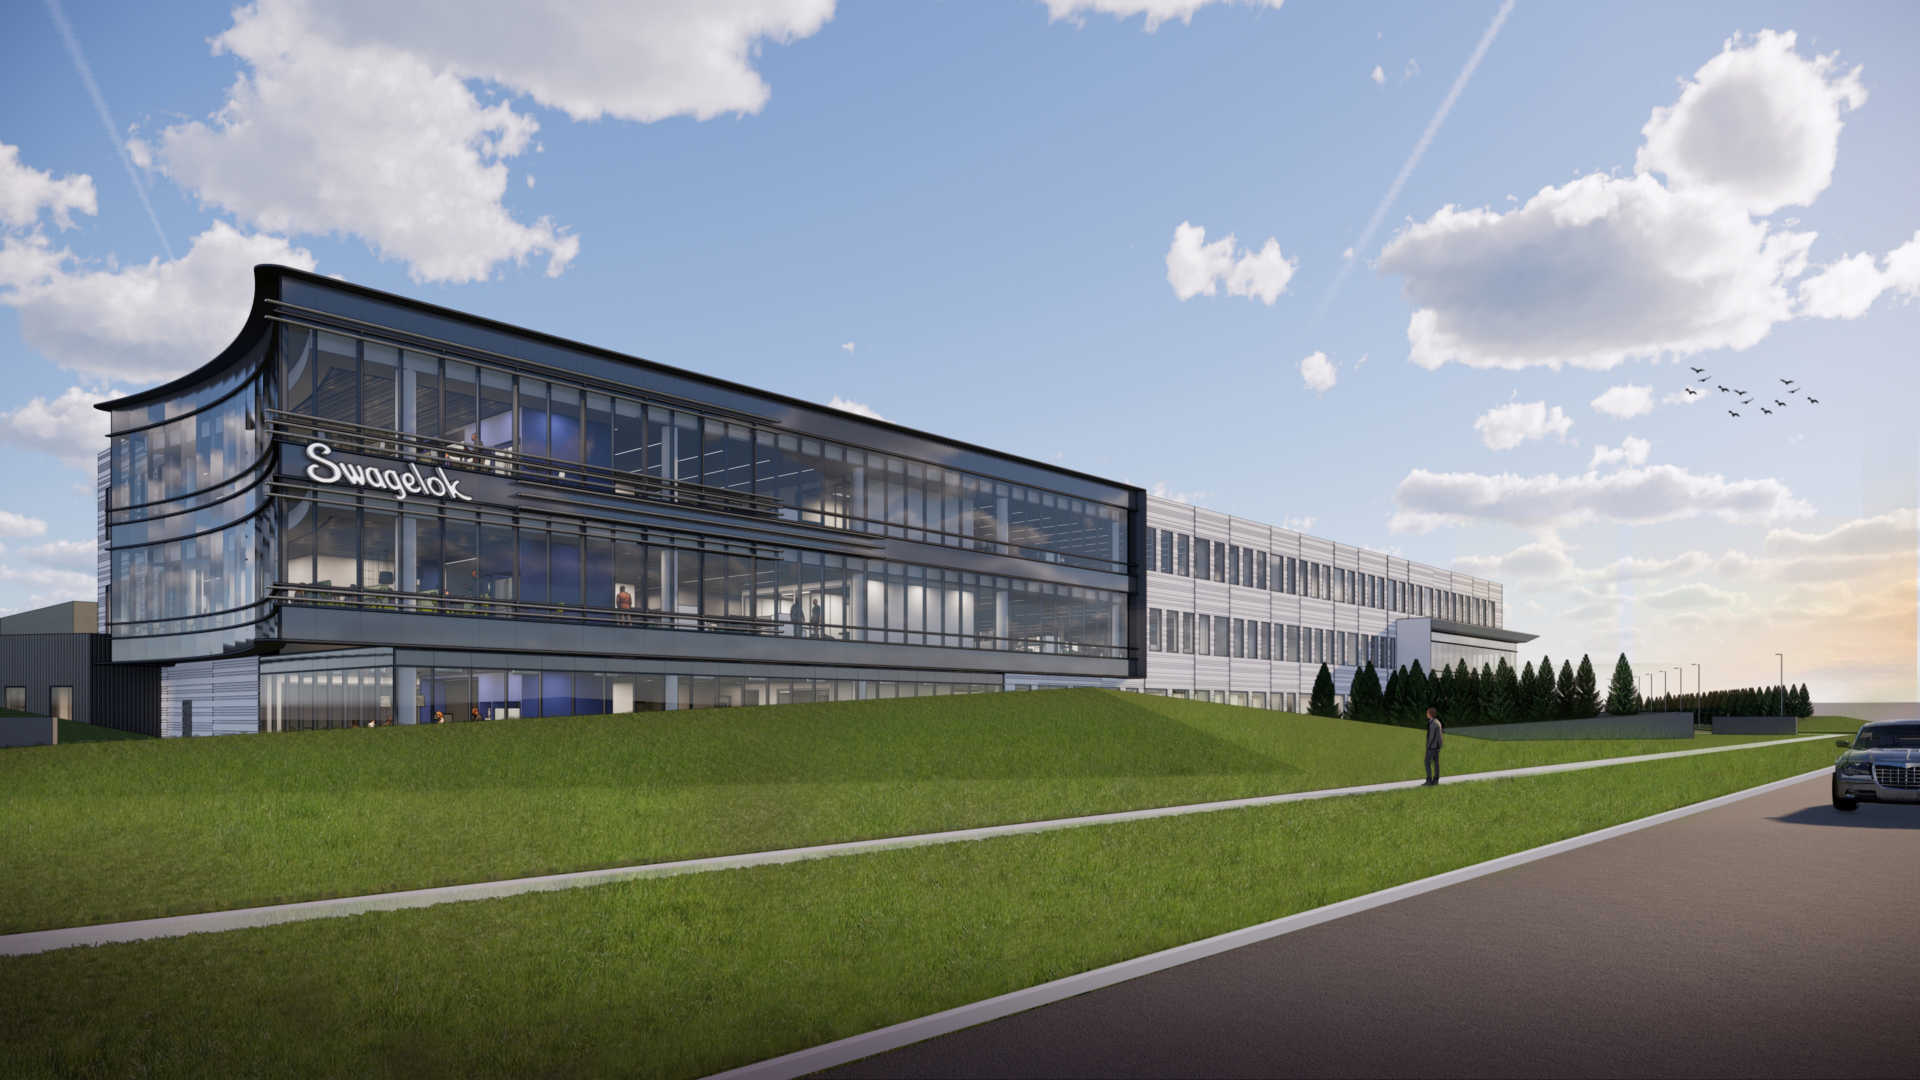 Rendering of Swagelok's new Headquarters